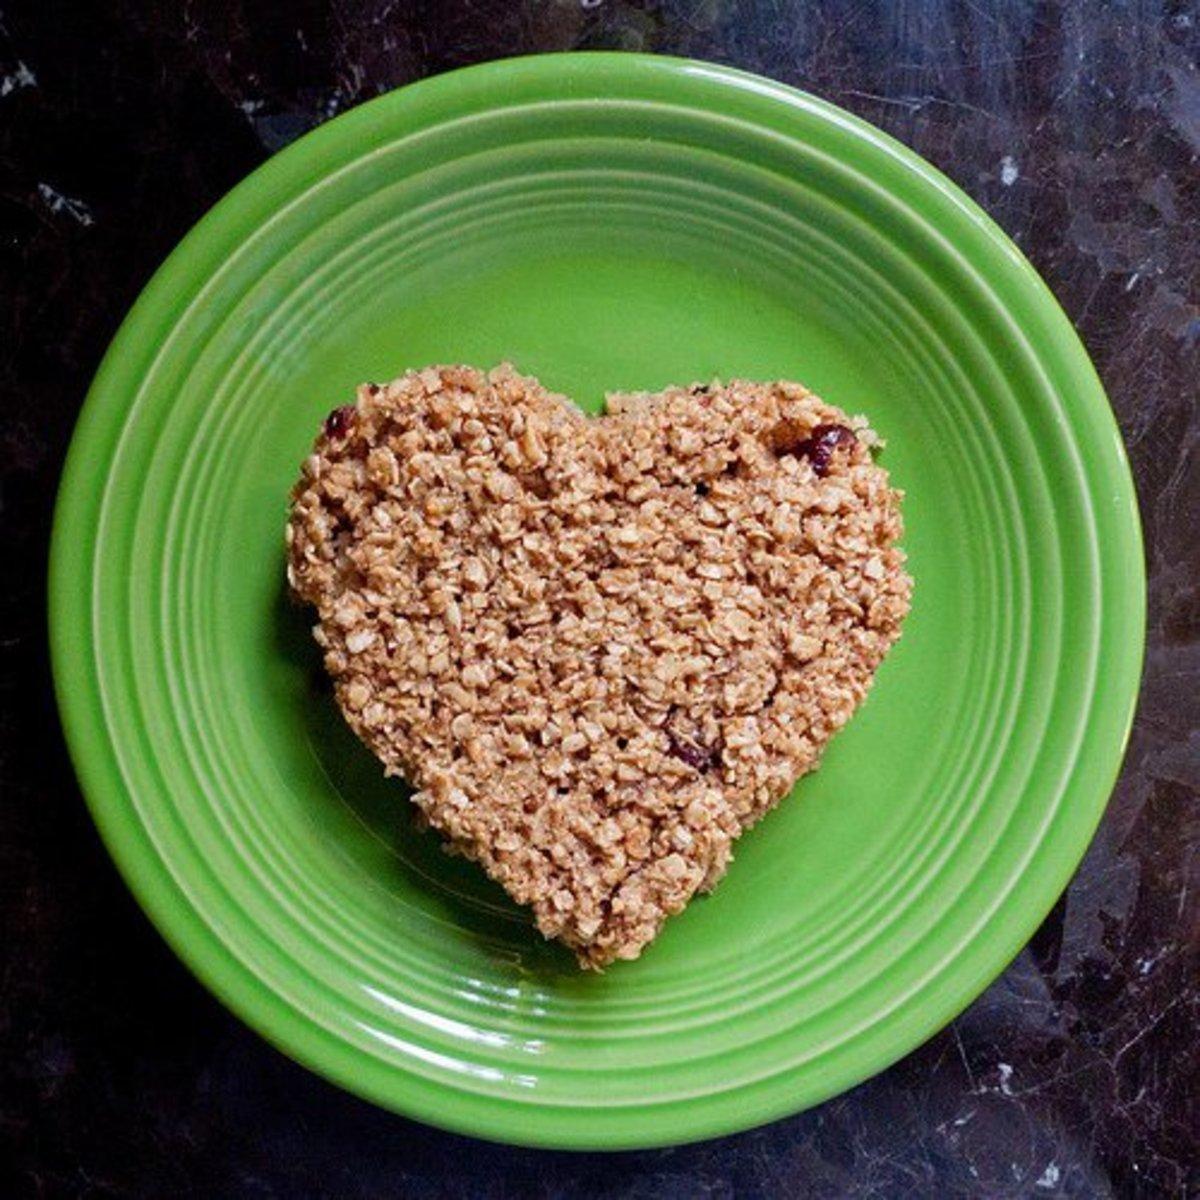 7 Oatmeal Recipes to Use Up Leftover Oatmeal